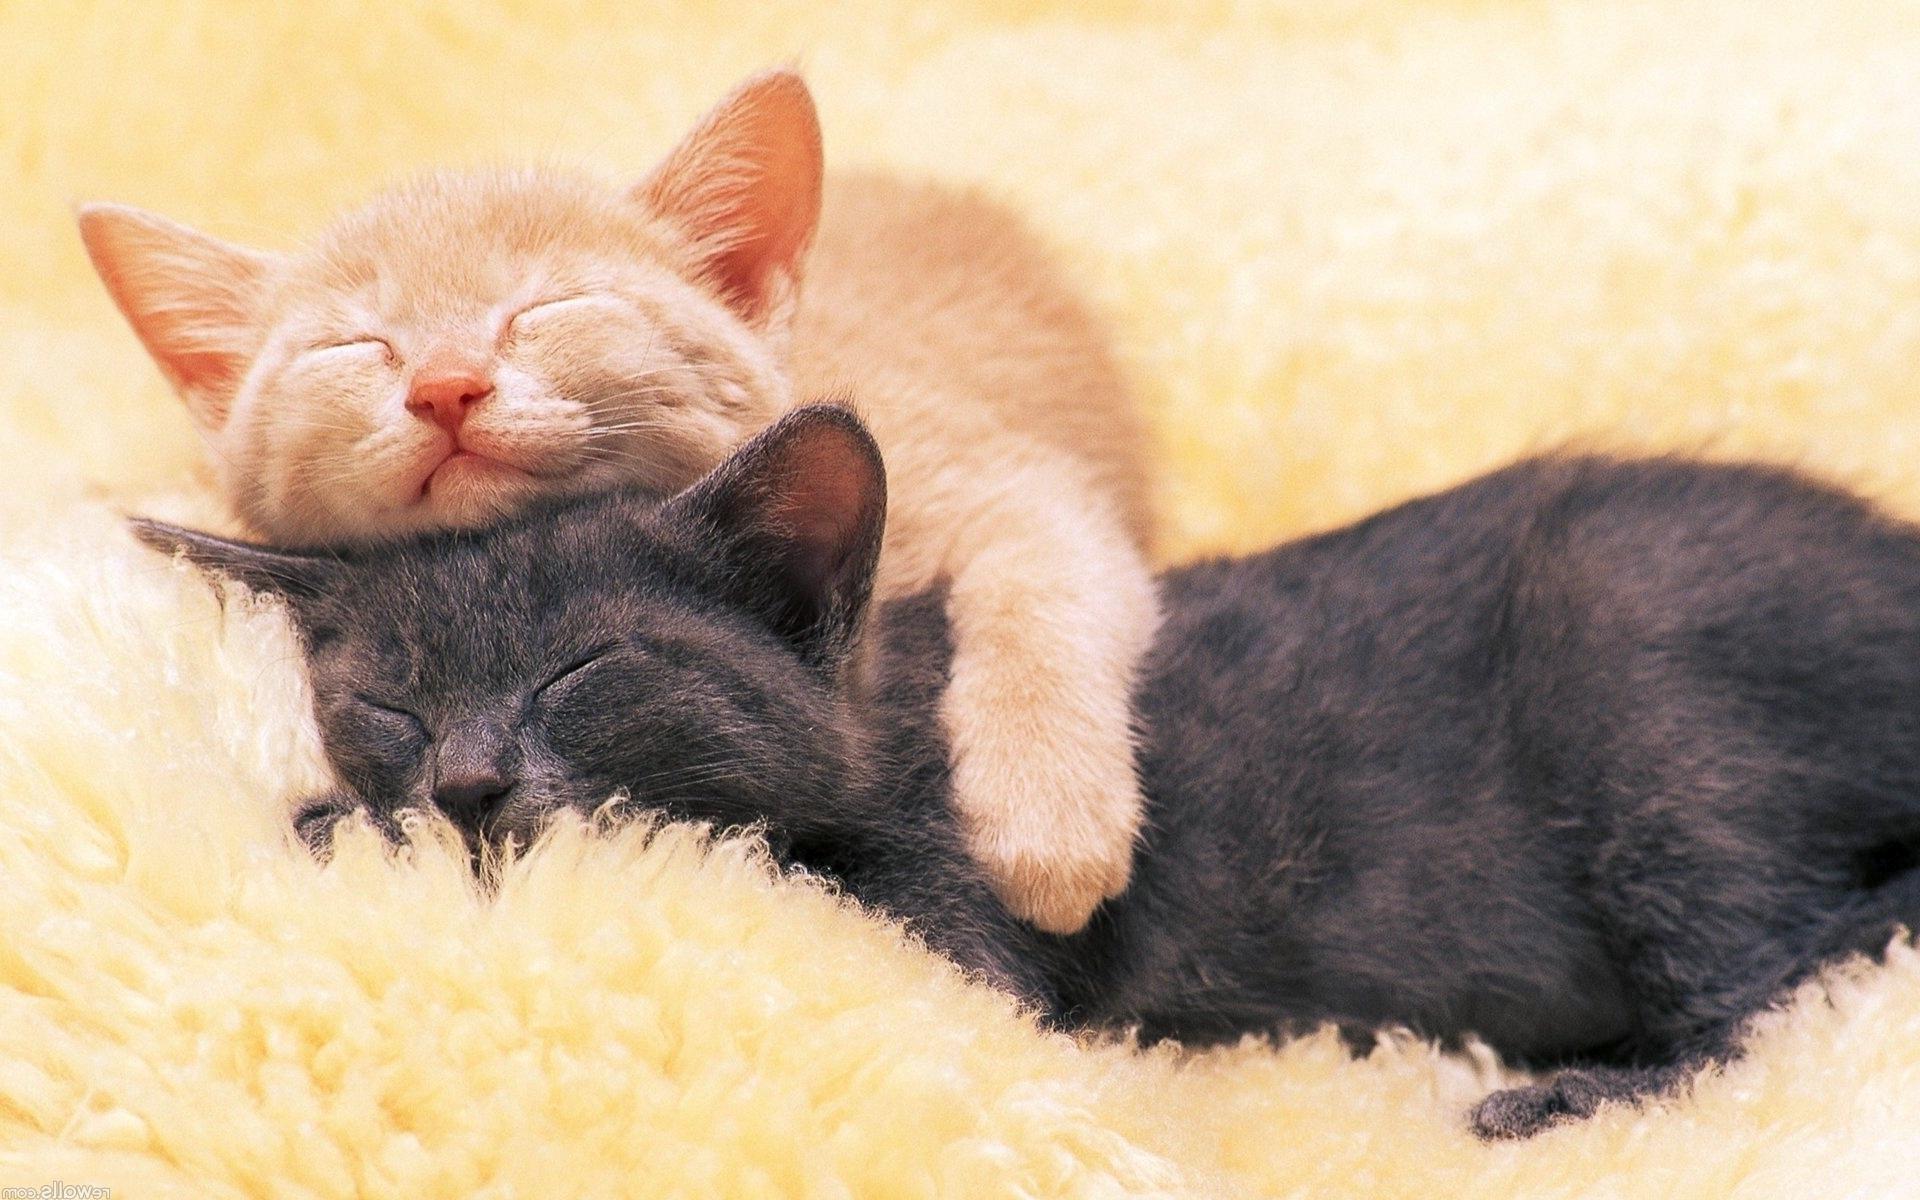 3d Name Live Wallpaper Download Sleeping Cats Hd Desktop Wallpapers 4k Hd